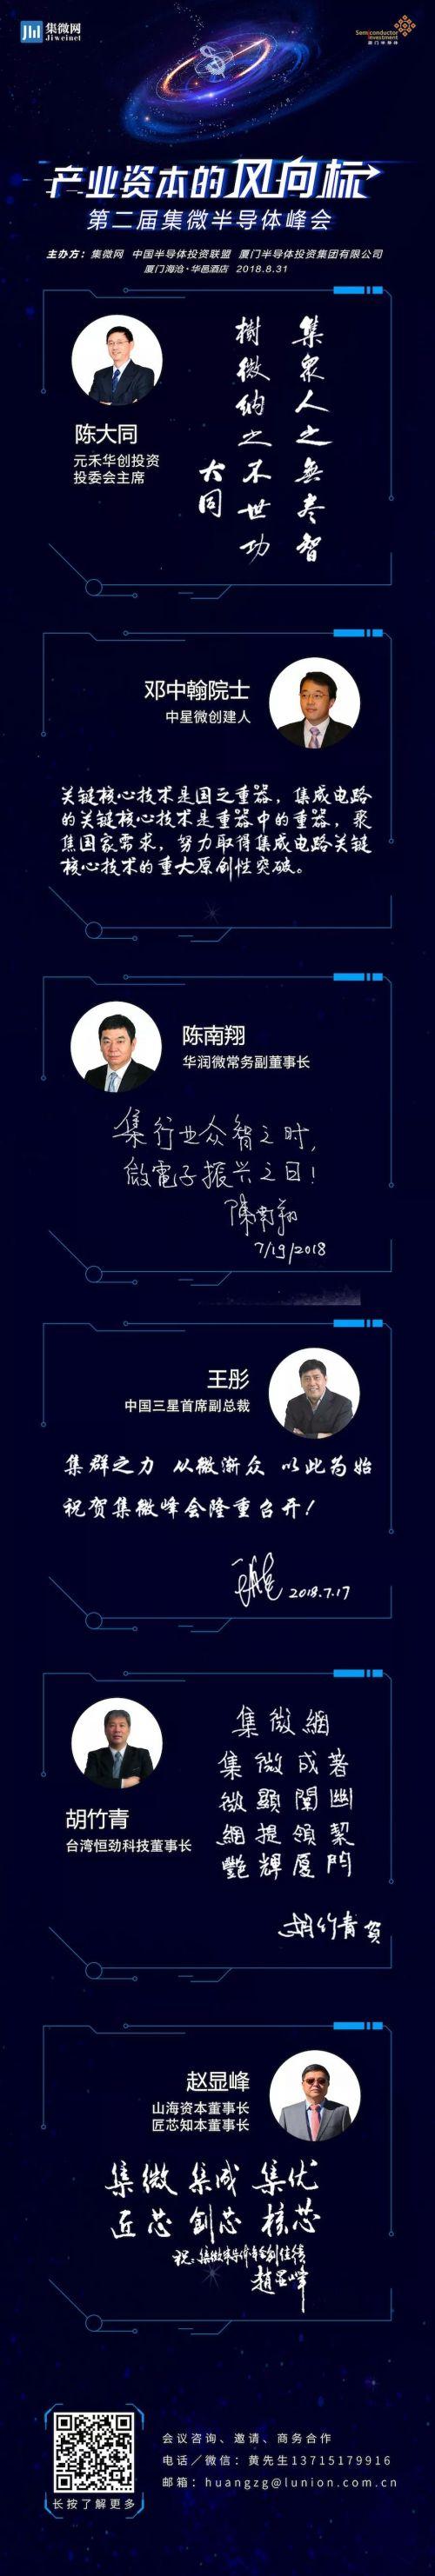 Arm吴雄昂、黄汪、石磊、张世龙、林永育寄语峰会8